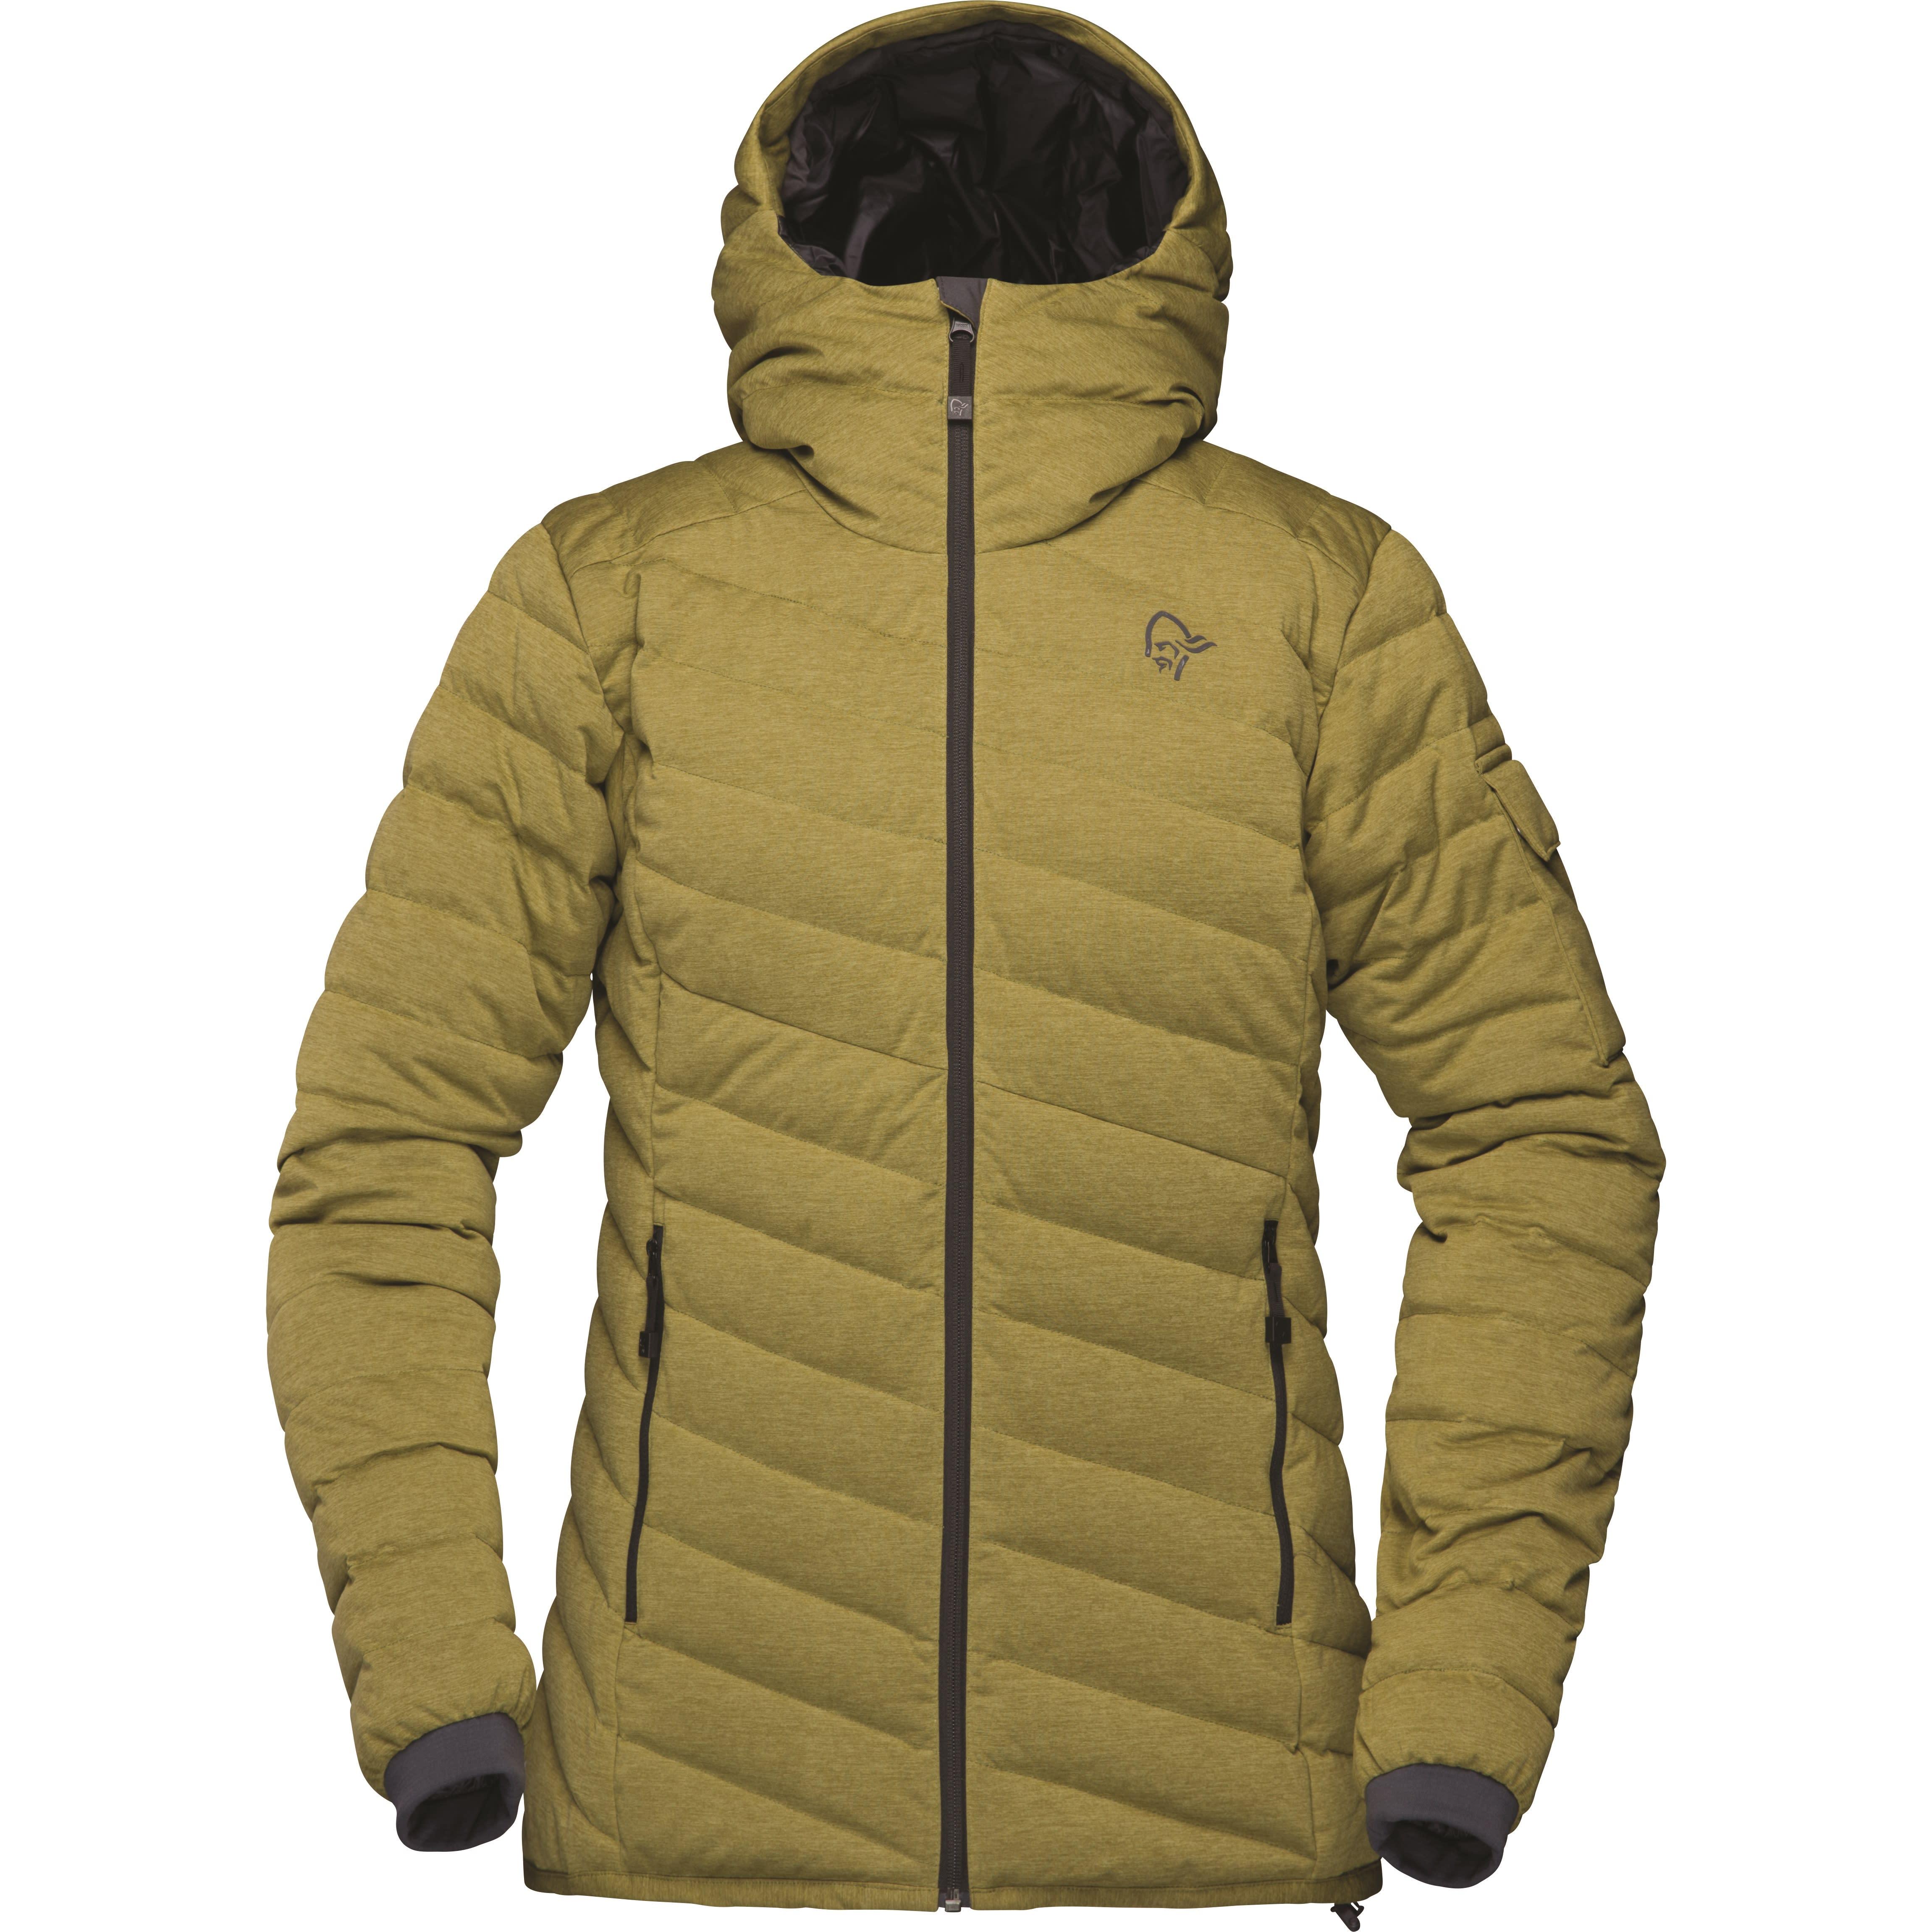 e5012ffe Kjøp Norrøna Tamok Light Down750 Jacket Women (2018) fra Outnorth